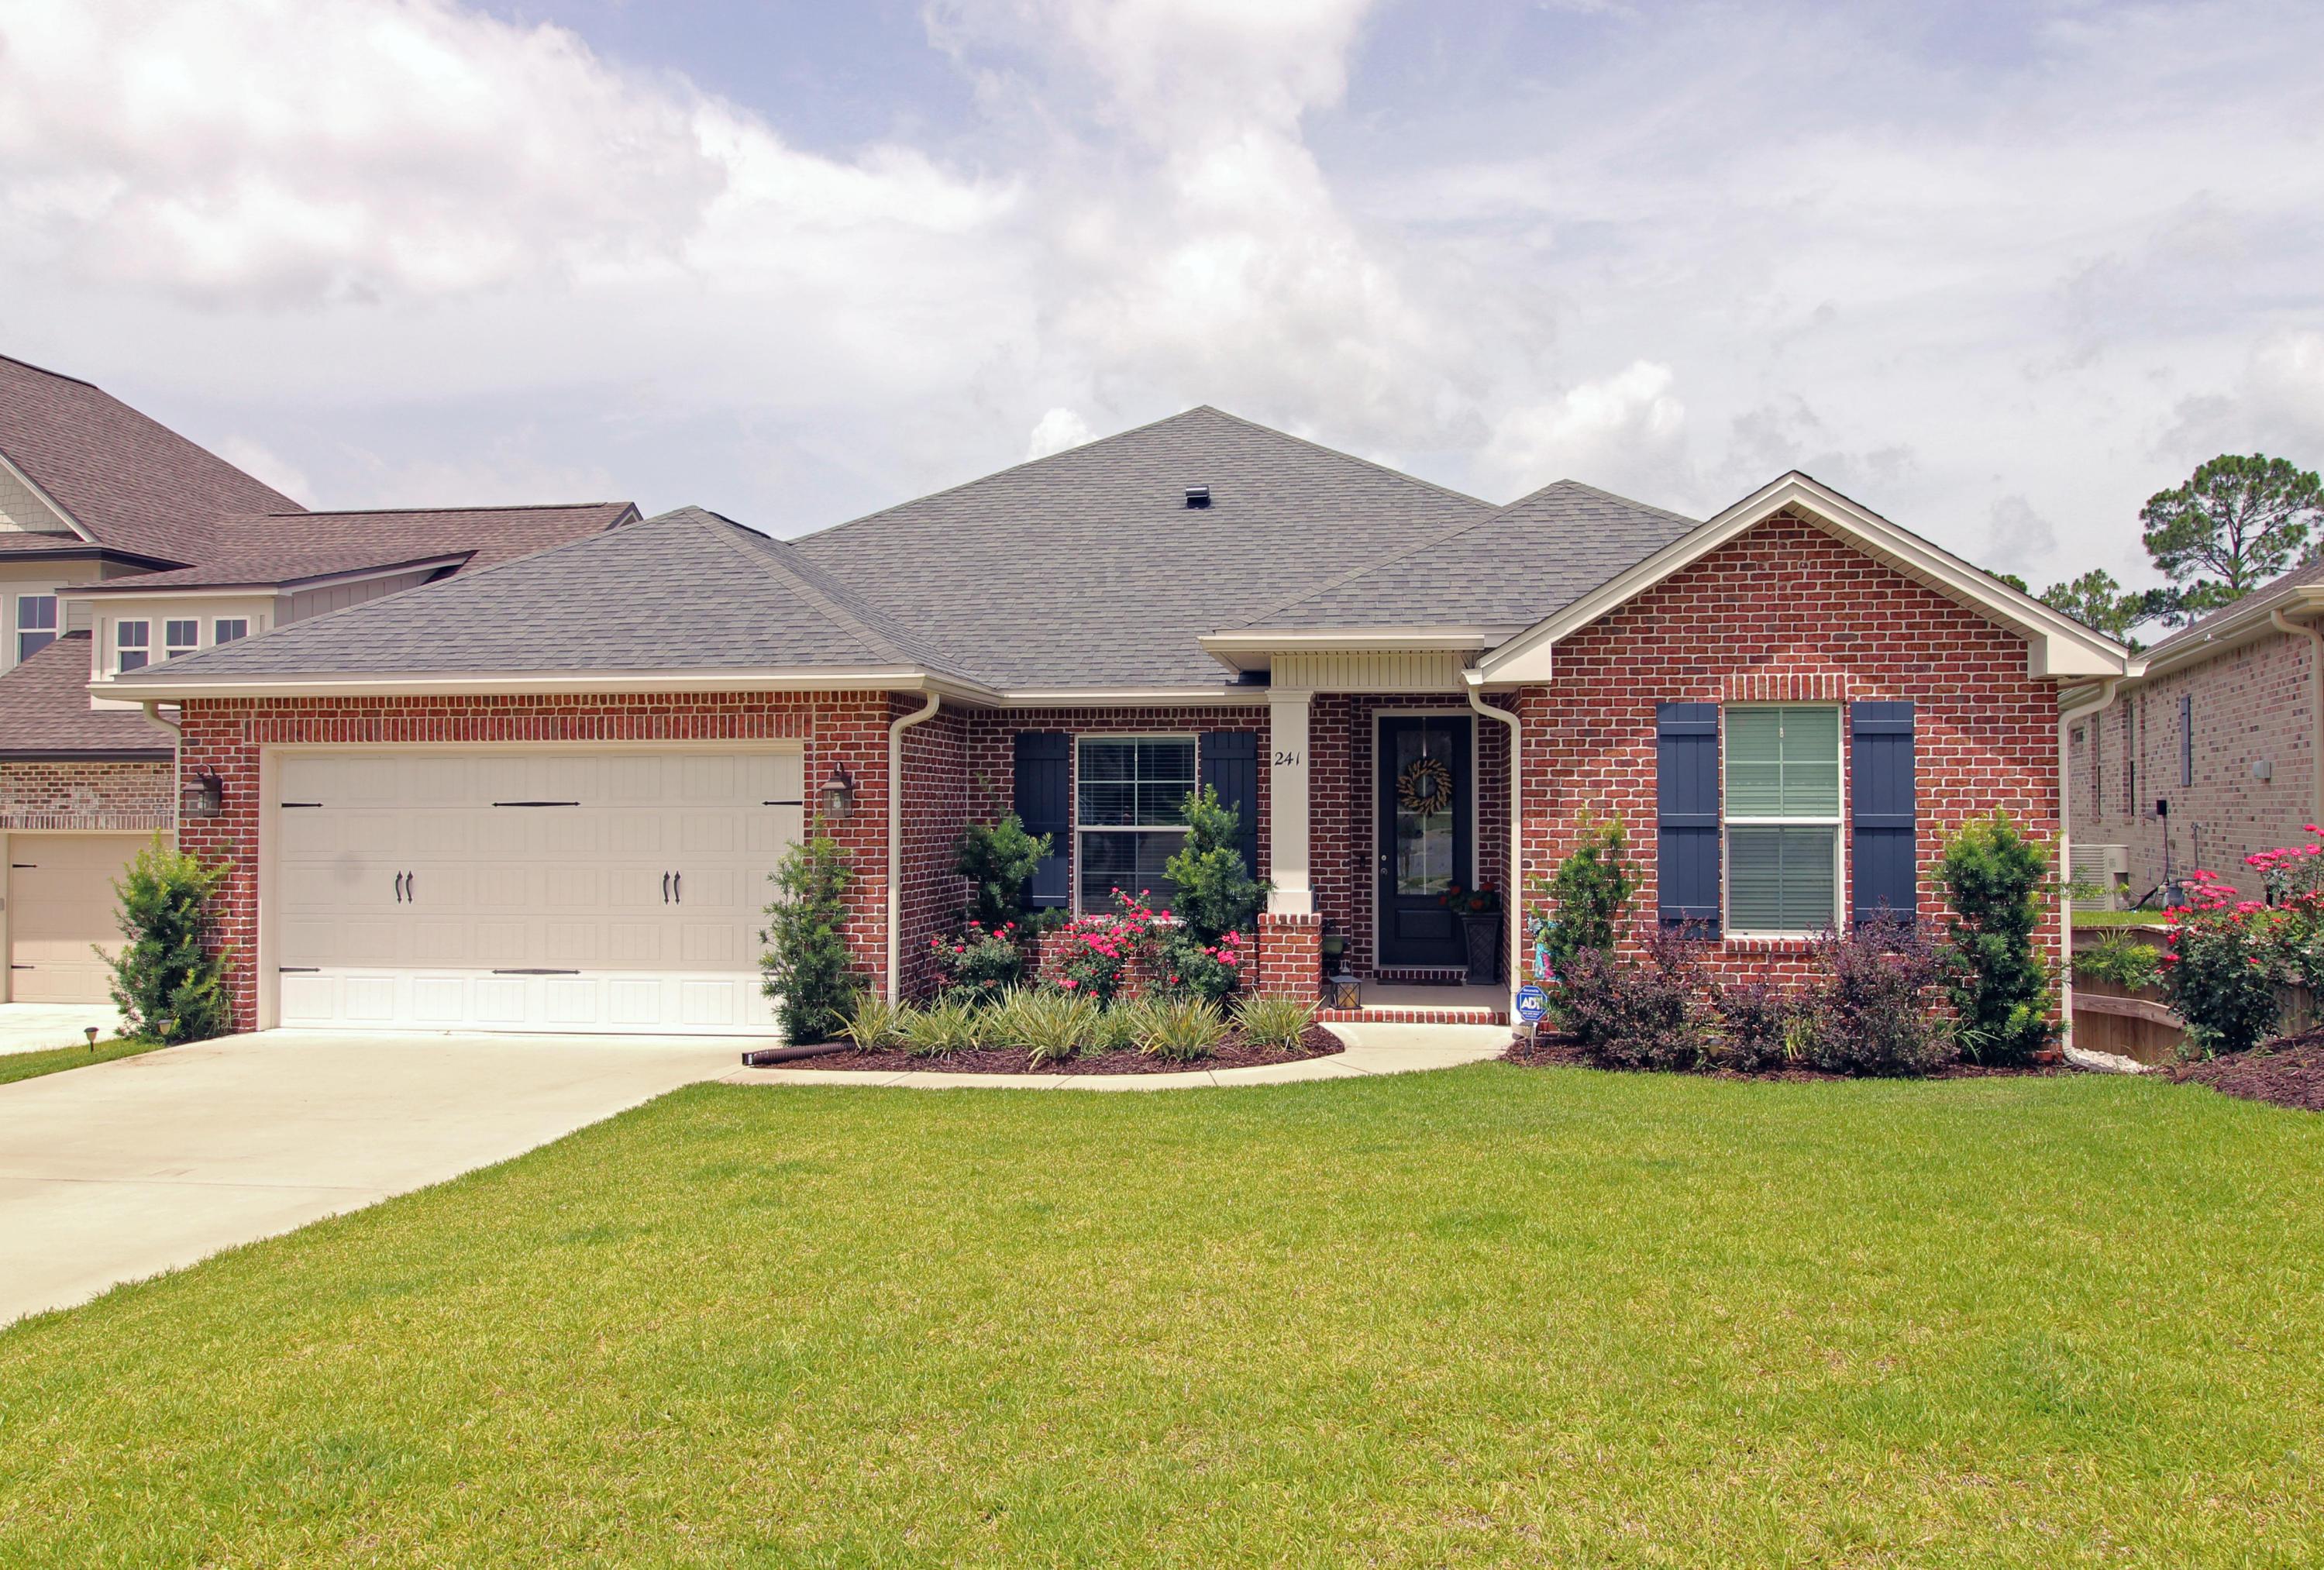 241  Gracie Lane, Niceville in Okaloosa County, FL 32578 Home for Sale